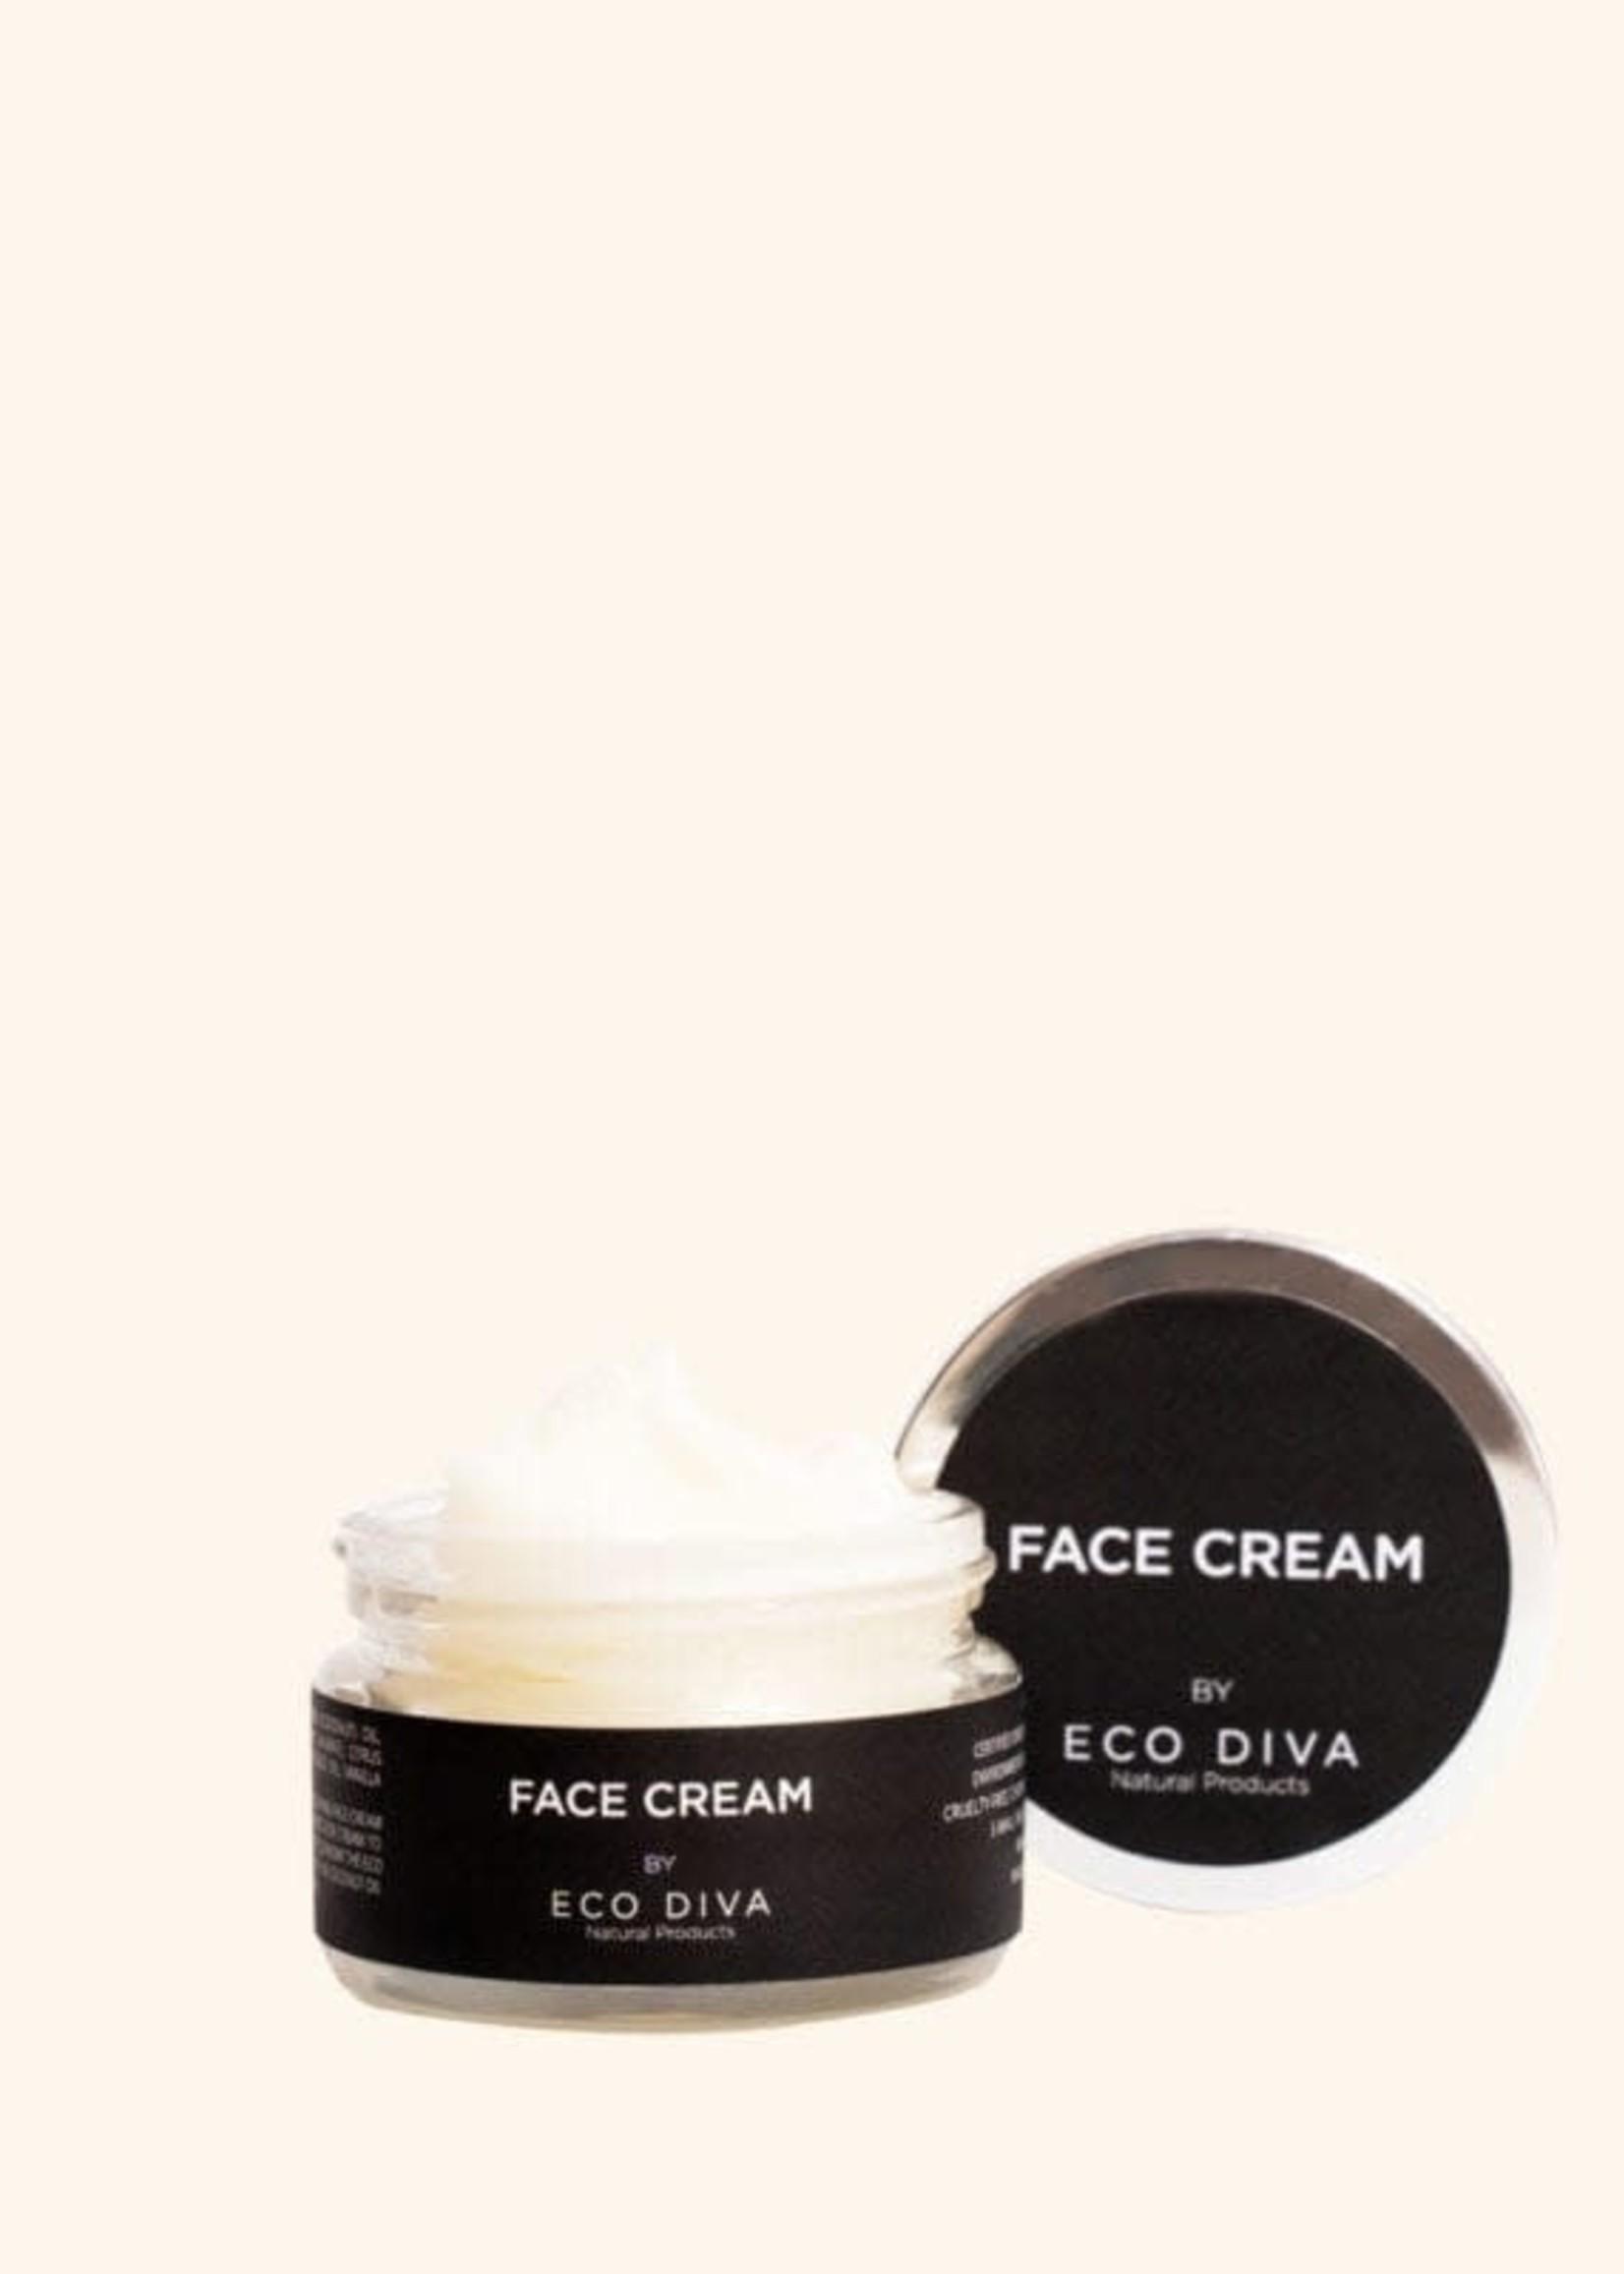 Eco Diva Eco Diva - Face cream 30g